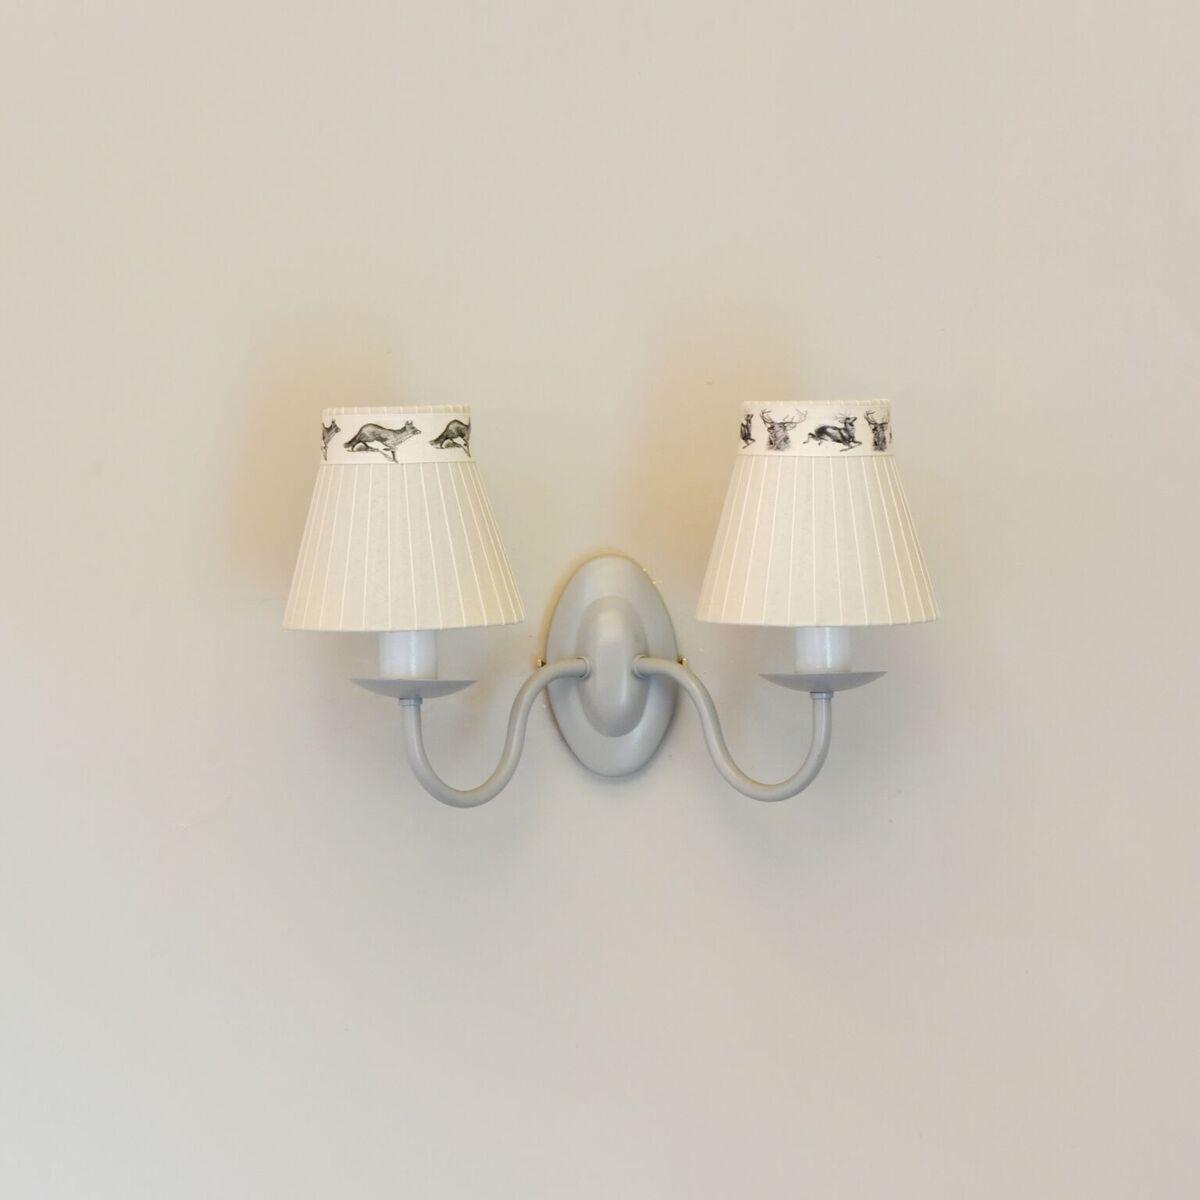 Kingston wall light double